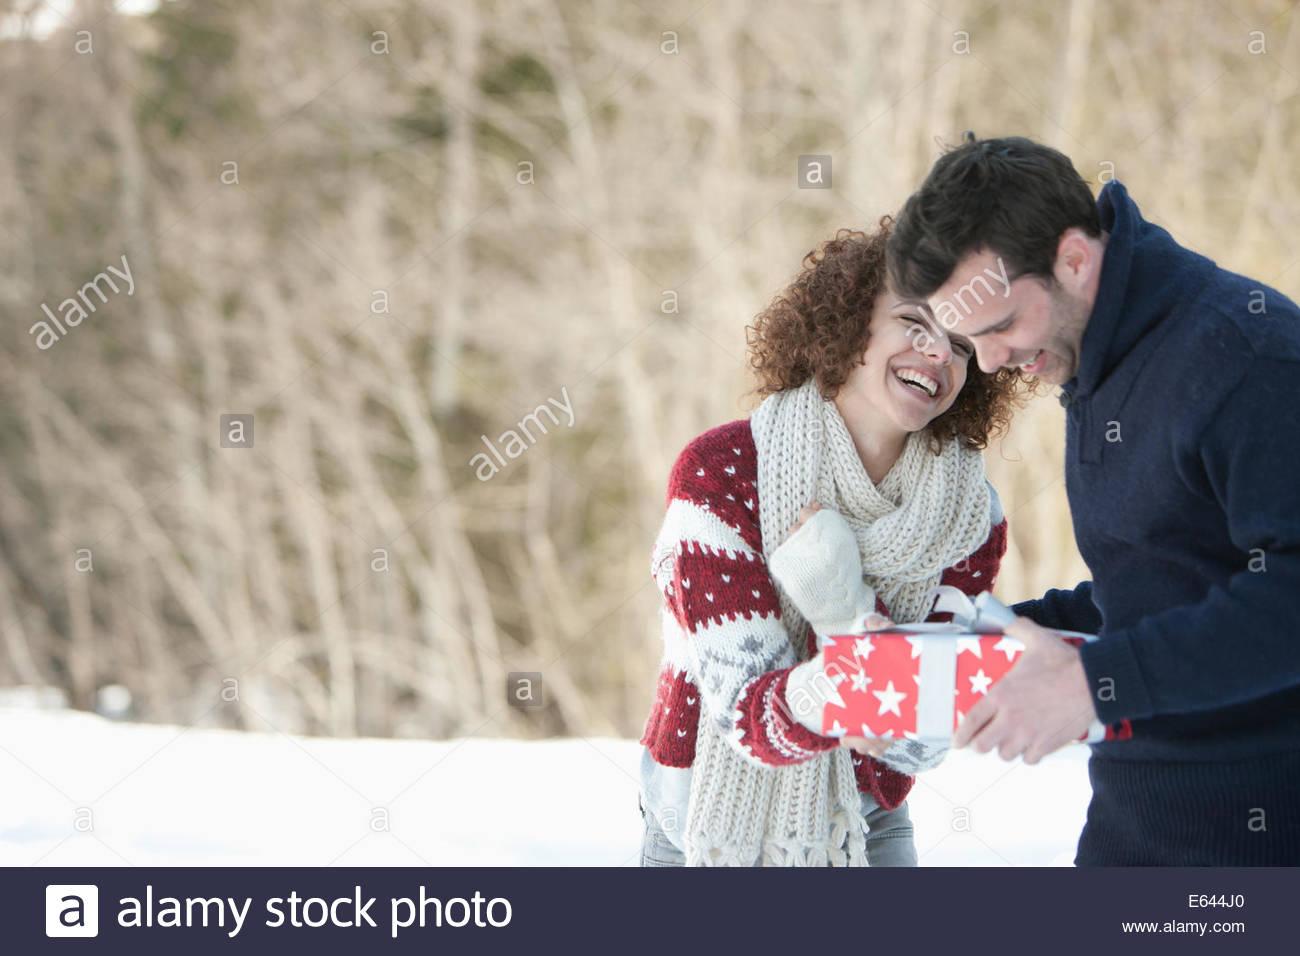 Man and woman embracing - Stock Image